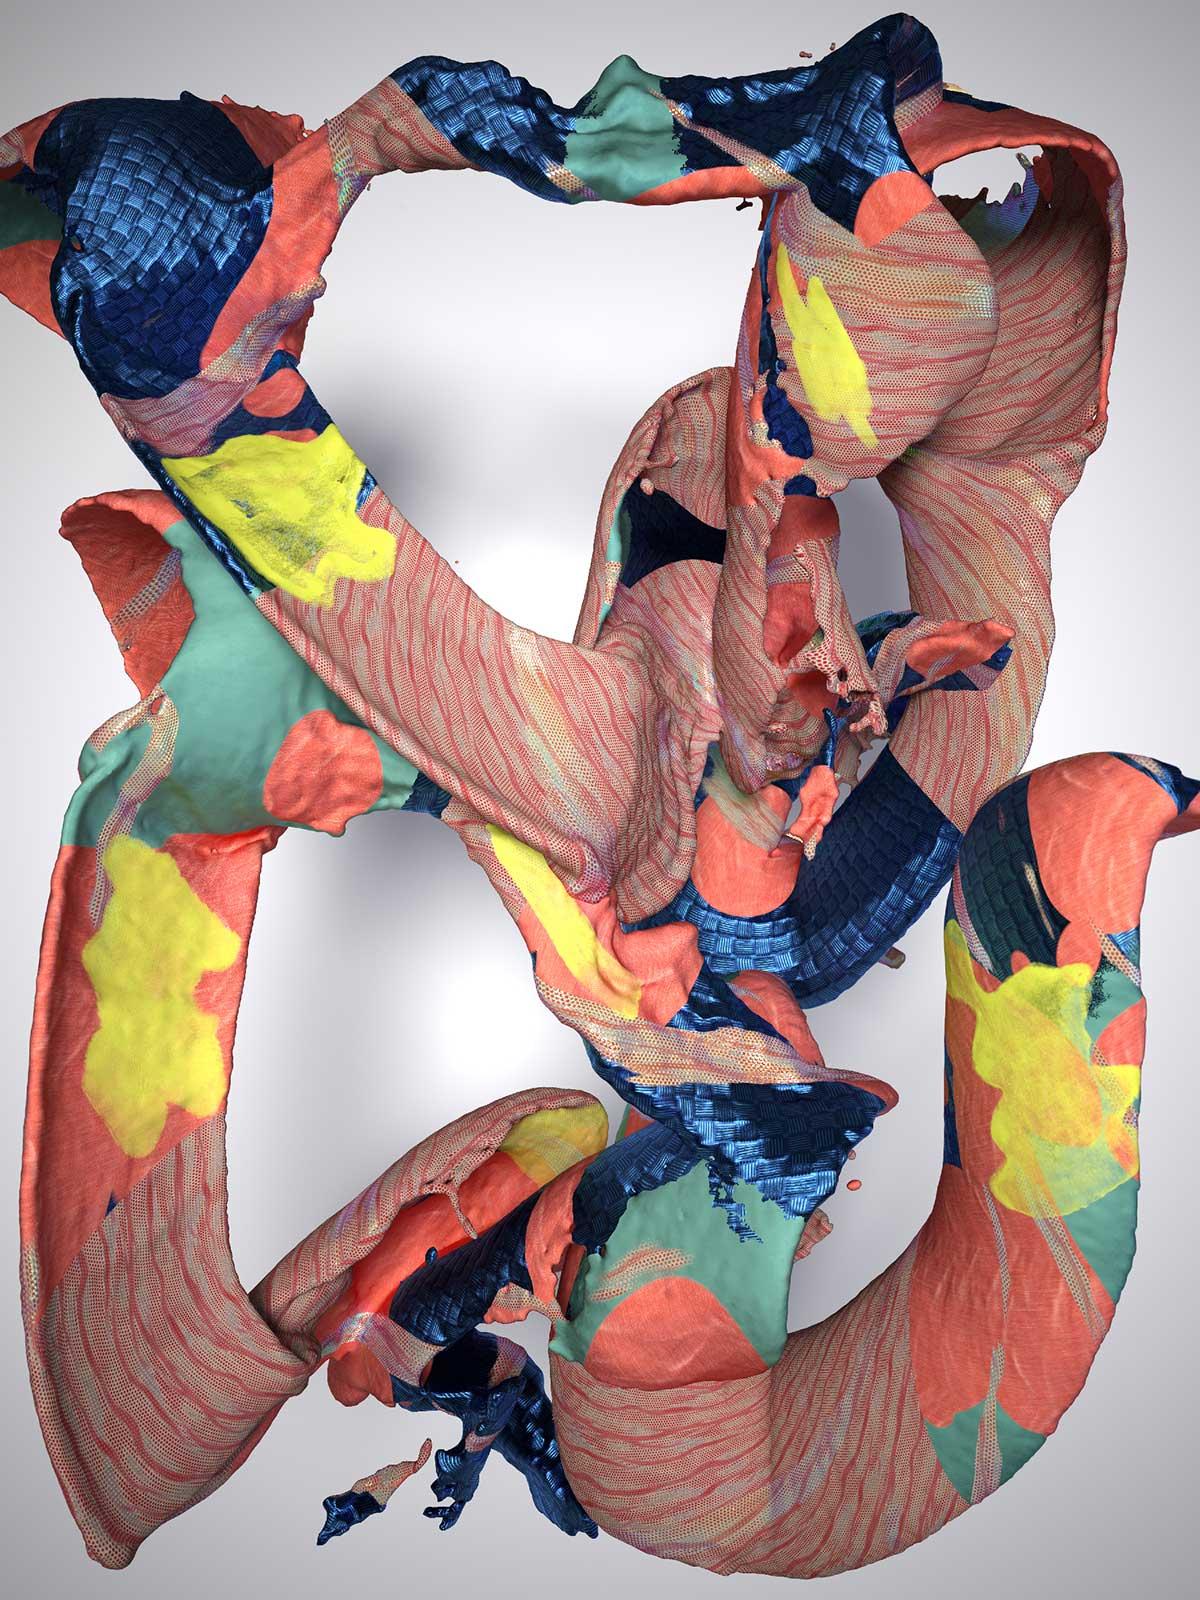 Substance I 05, CGI Fine Art Print, 140 x 105 cm, 2017